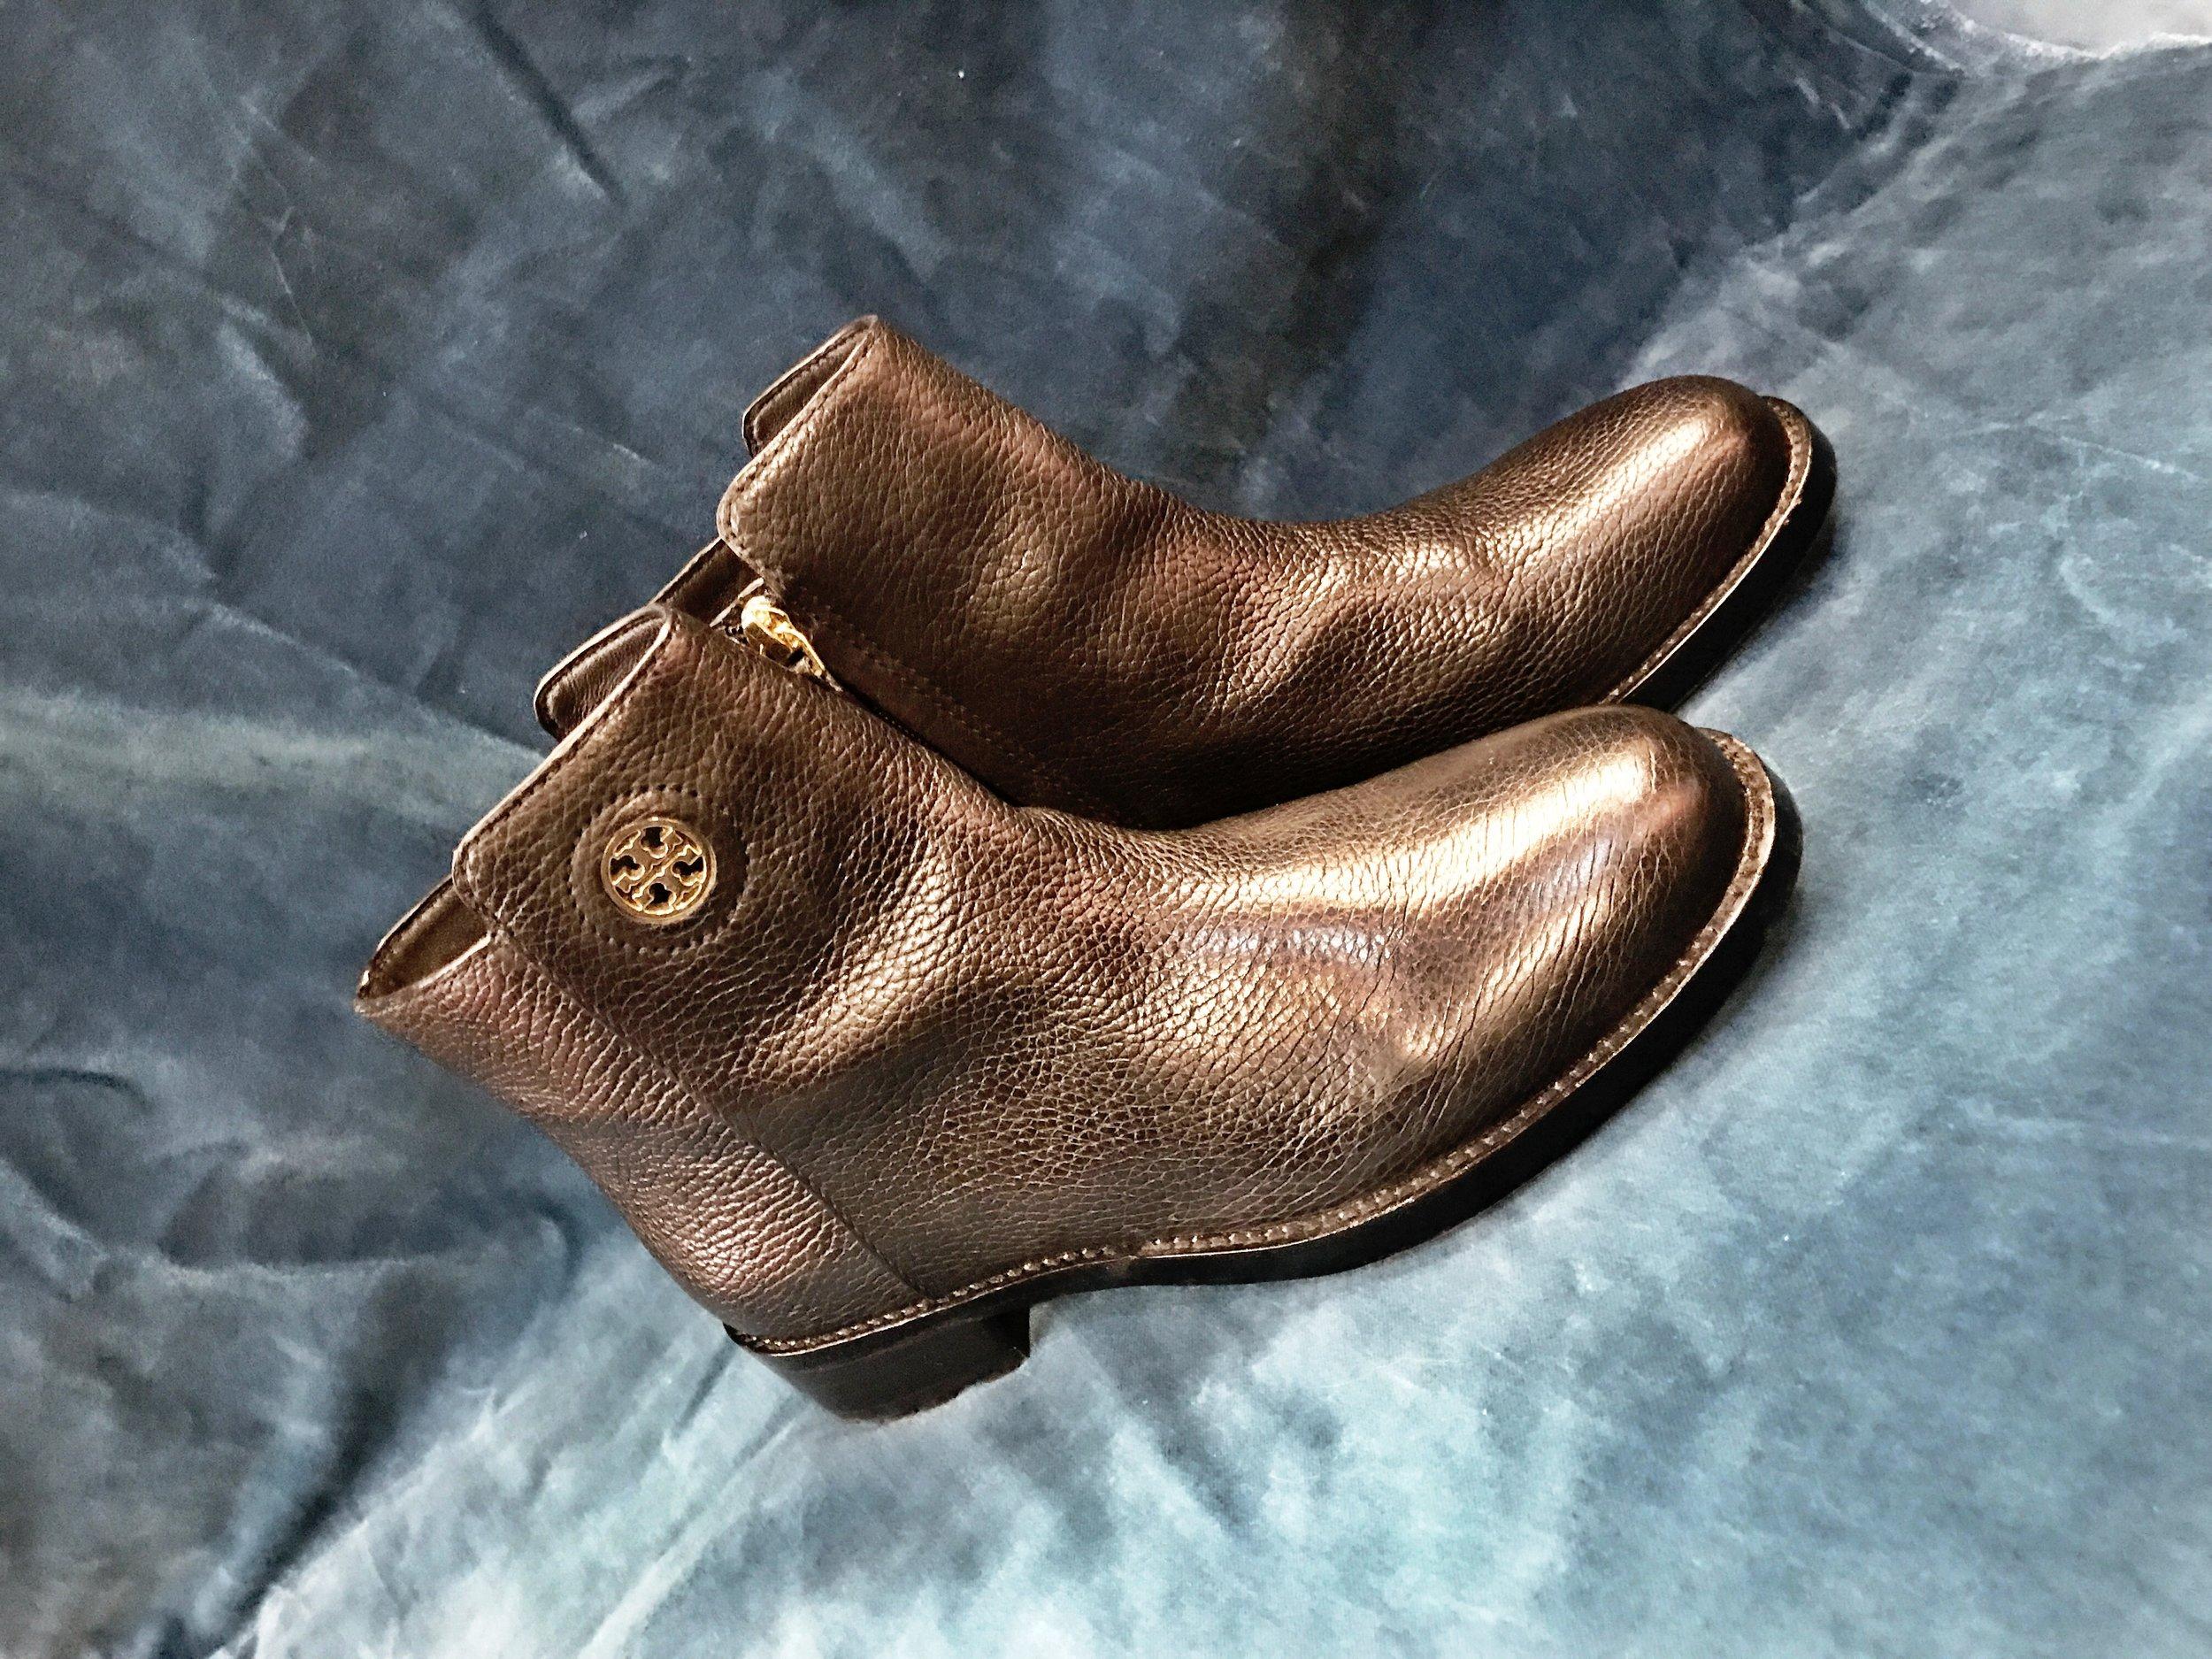 Tory Burch booties, $108 (originally $358), size 7.5